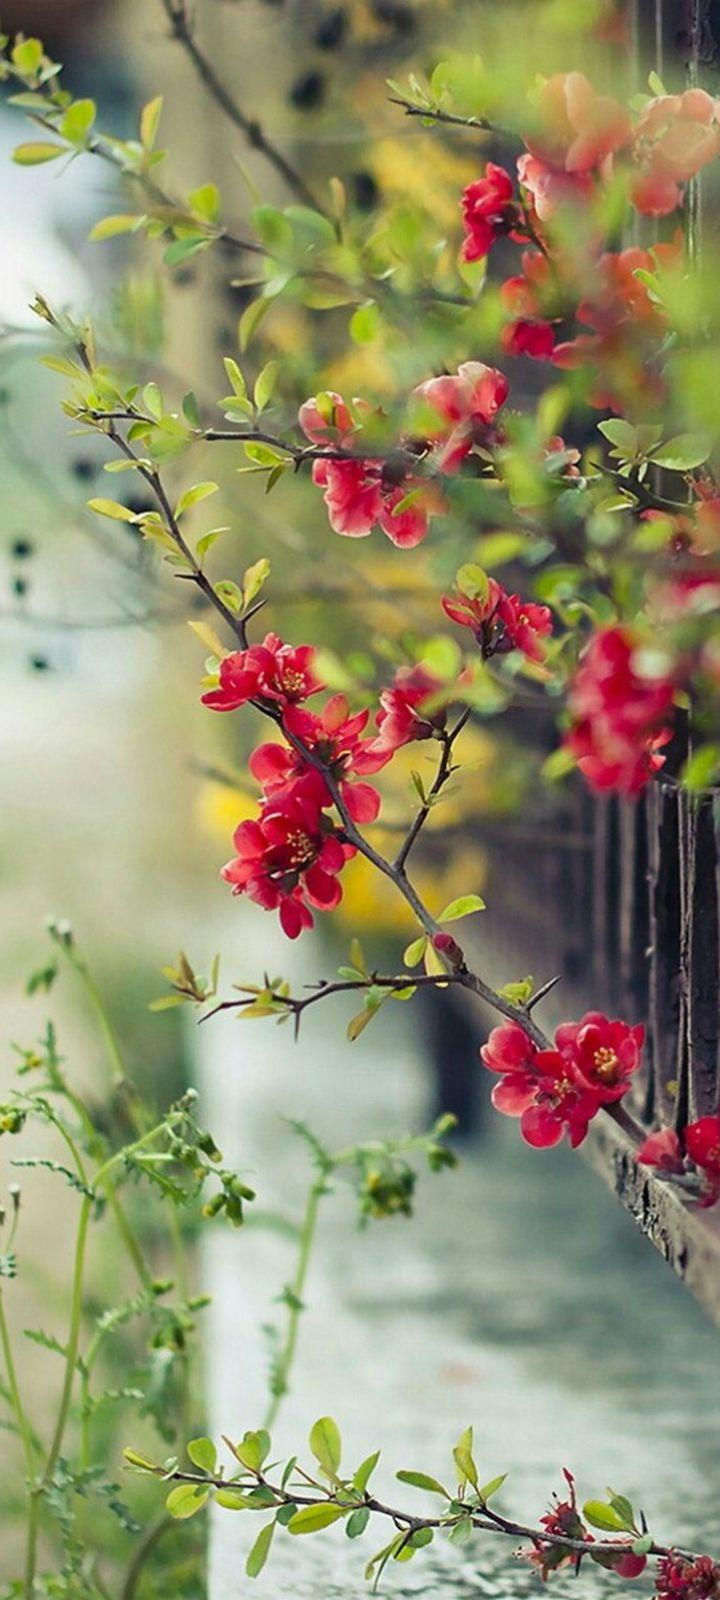 Red Flowers Wallpaper 720x1600